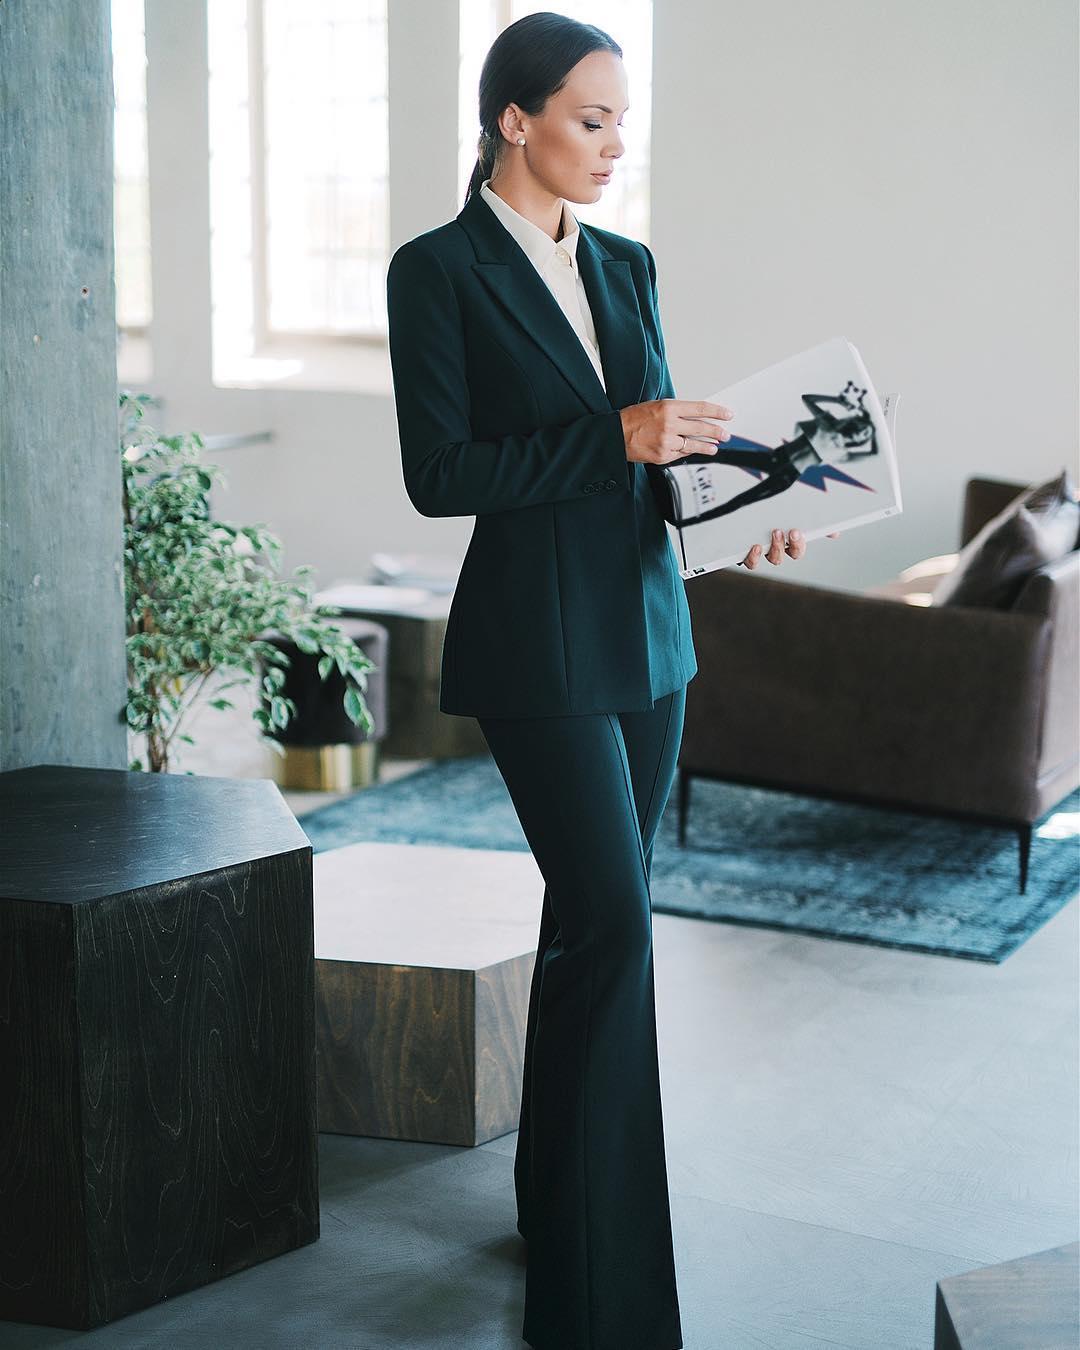 traje ejecutivo de mujer